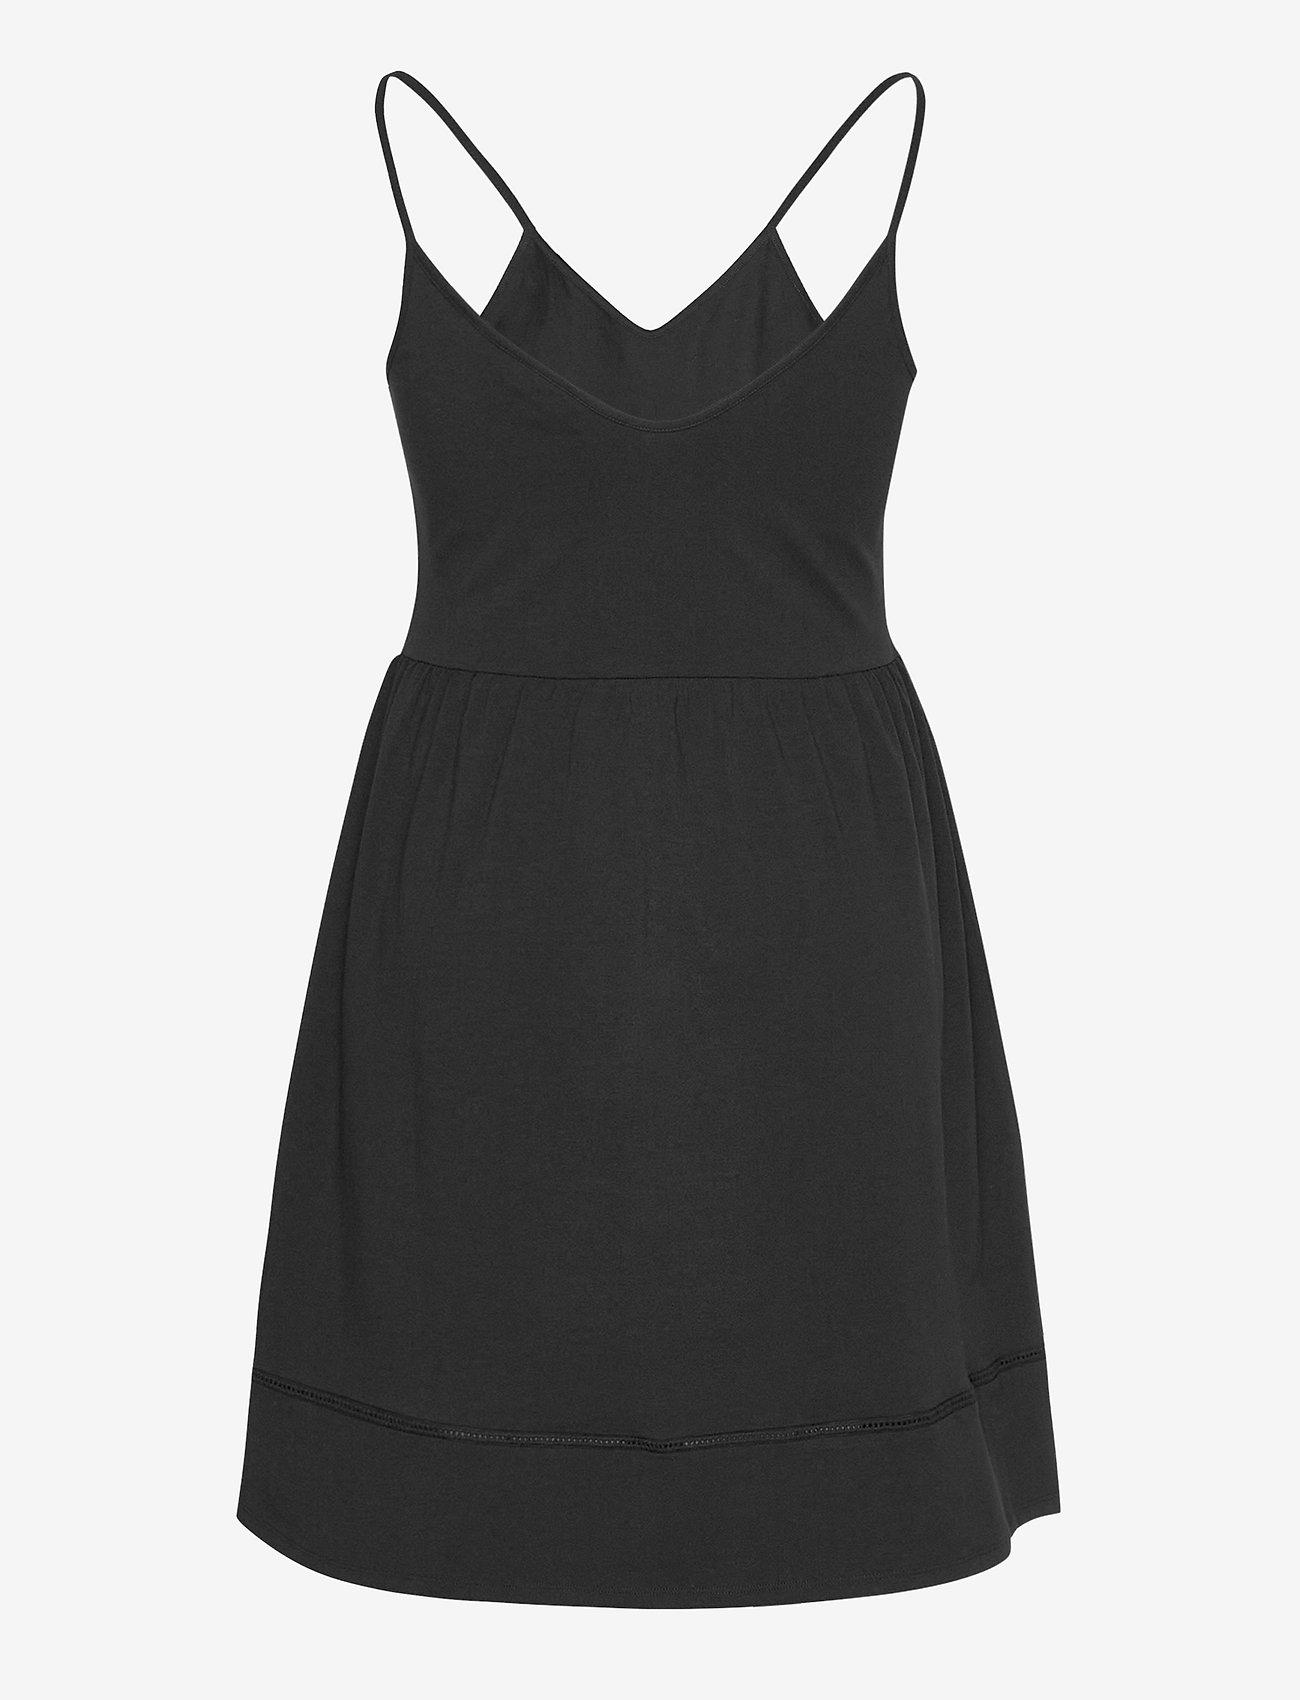 ONLY Carmakoma - CARKALLON LIFE  SL KNEE DRESS ESS - short dresses - black